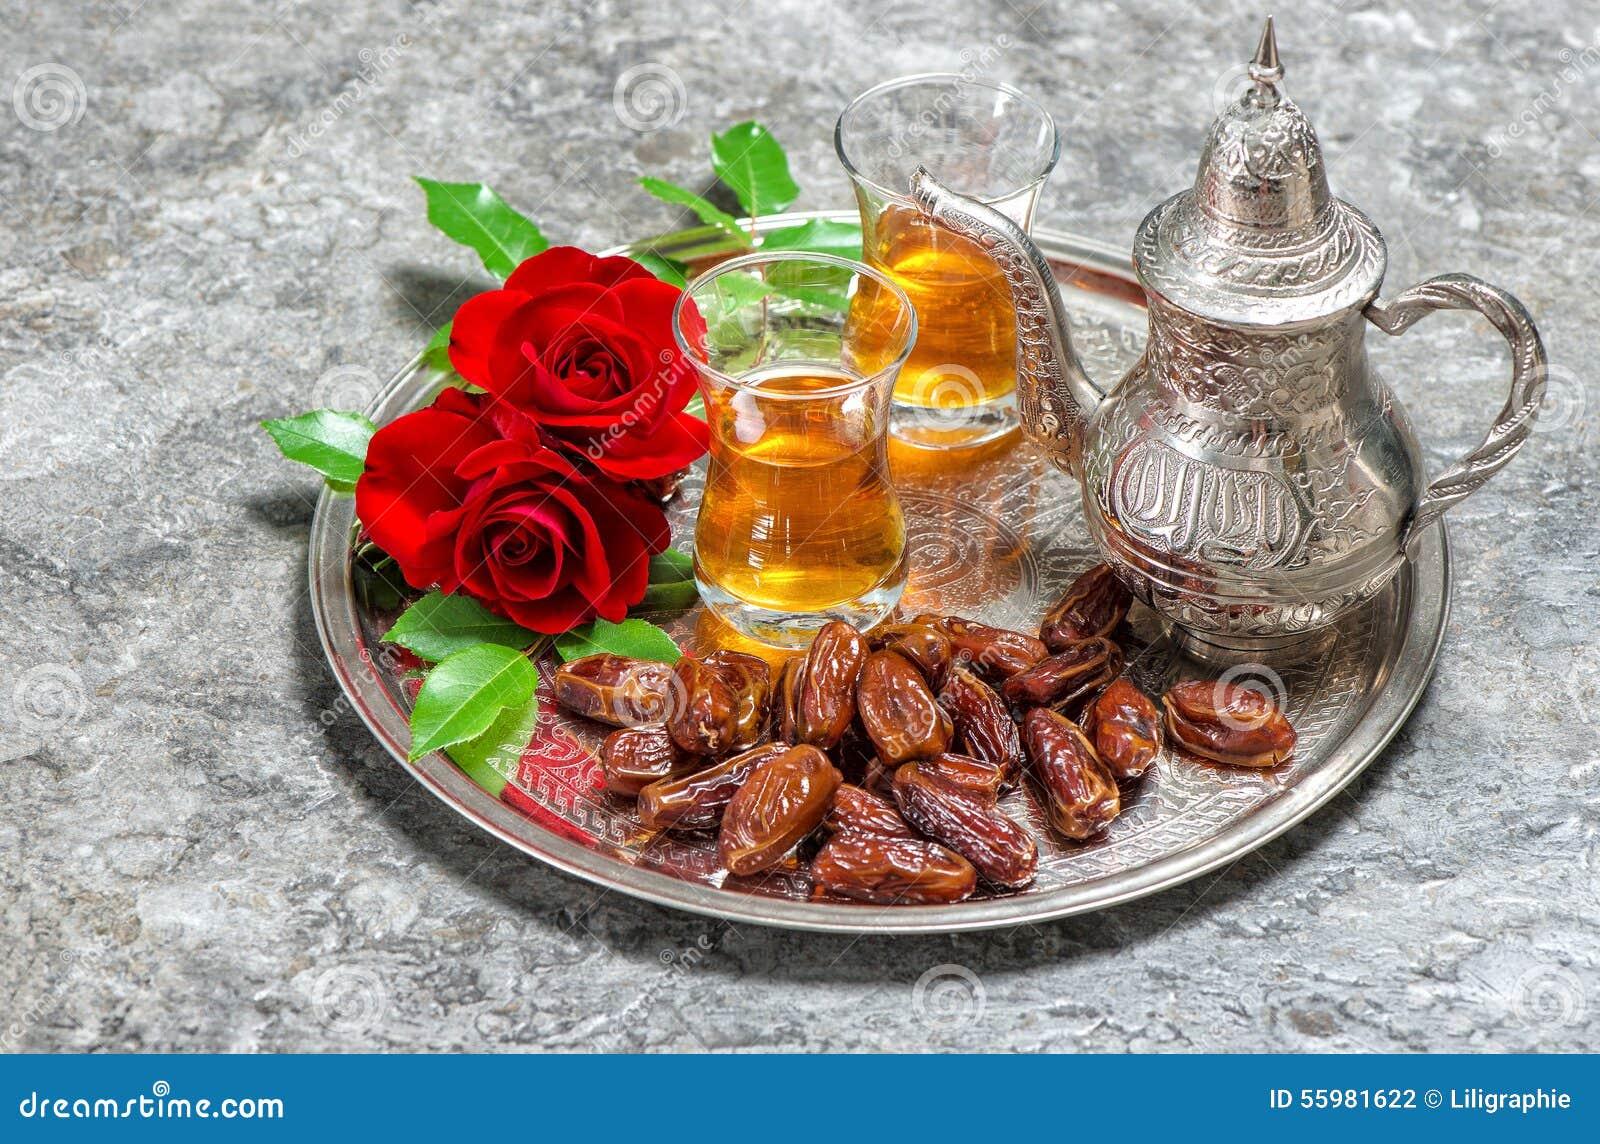 Datierung in islam quran Azubi speed dating düsseldorf 2014